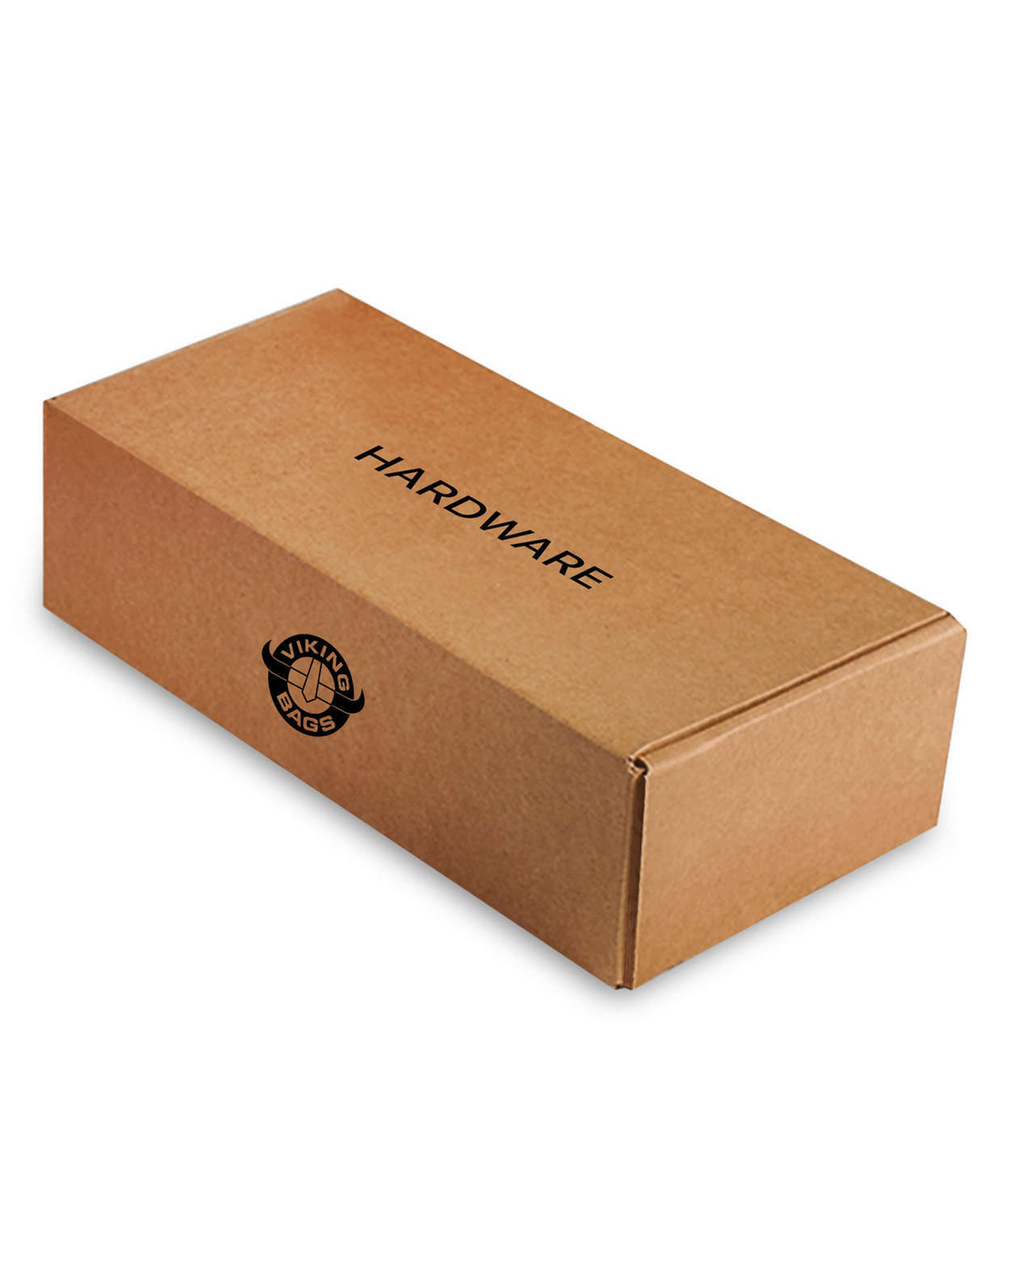 Honda 750 Shadow Spirit (Incl. C2) Medium Slanted Studded Motorcycle Saddlebags Box